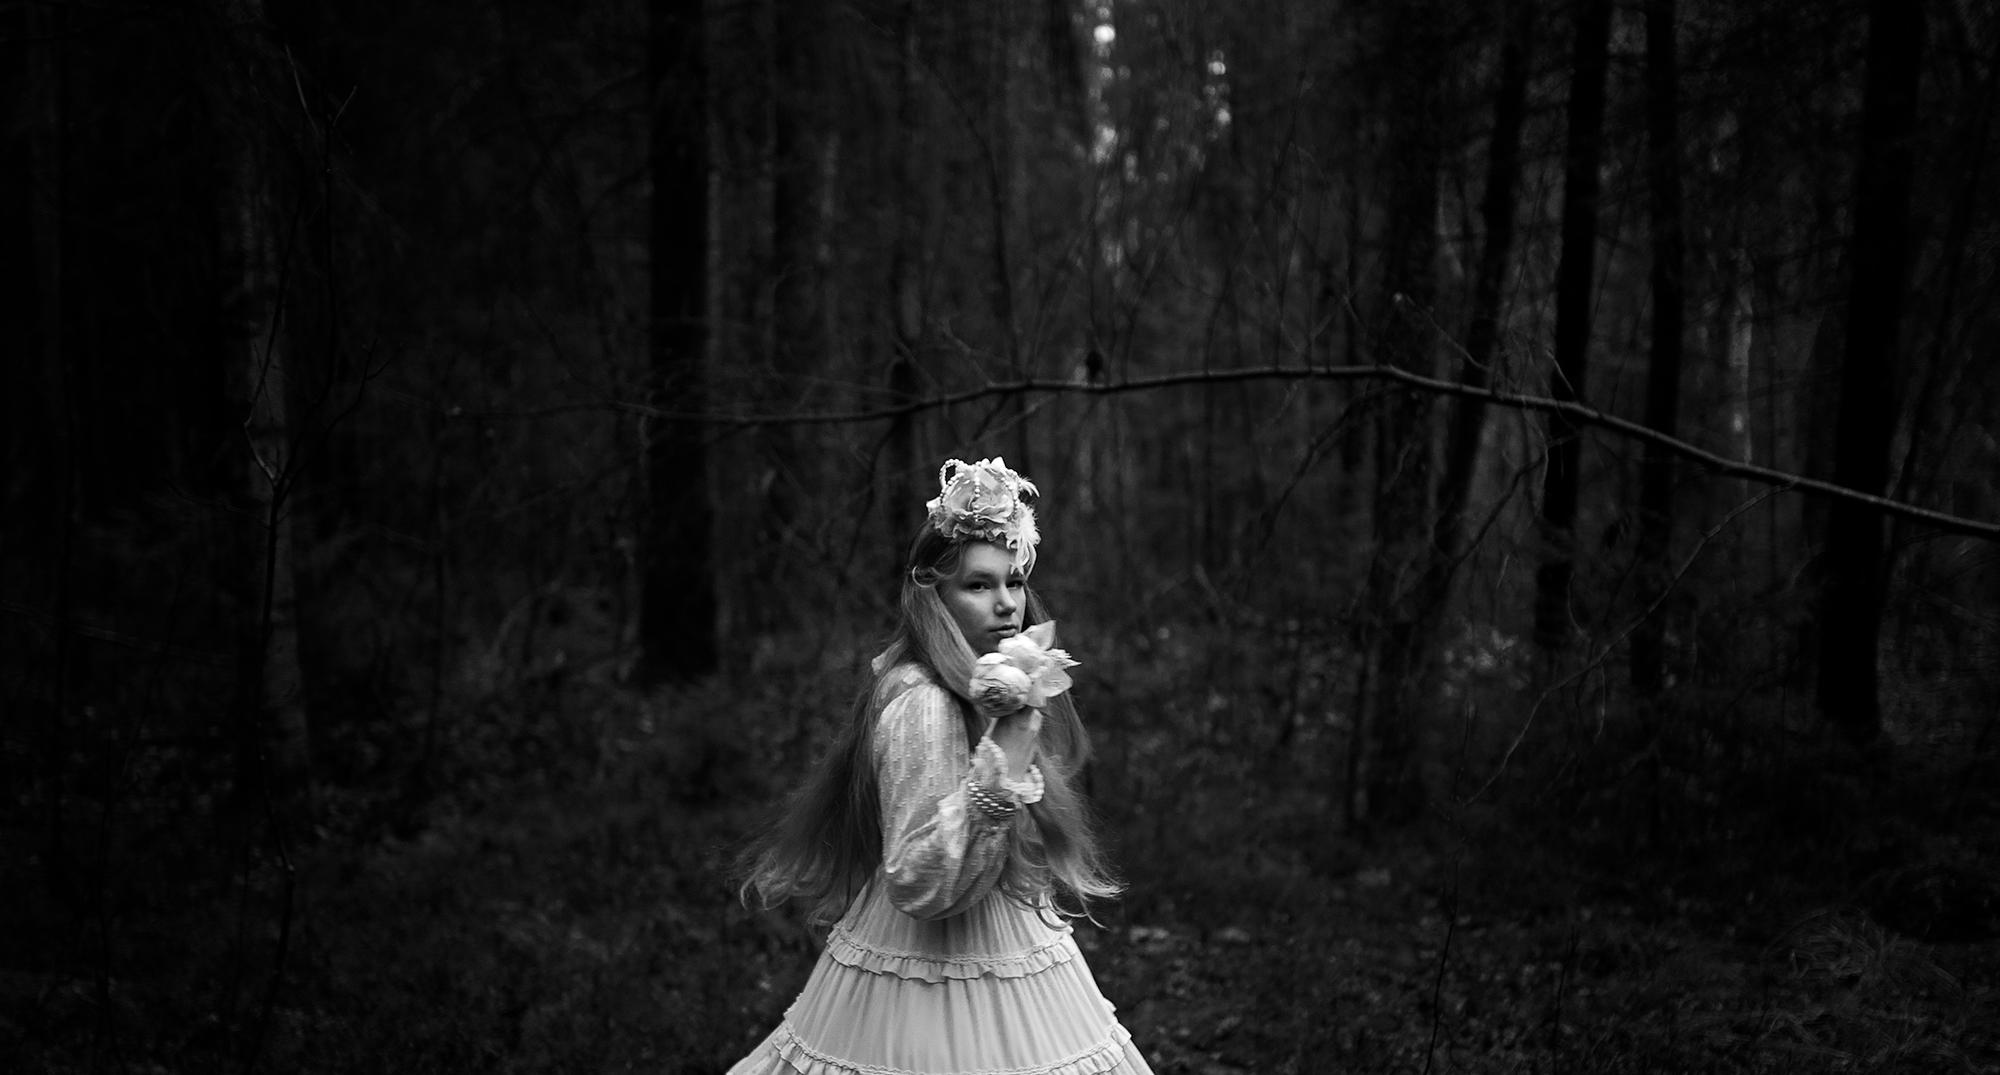 Alice_consept_05.jpg